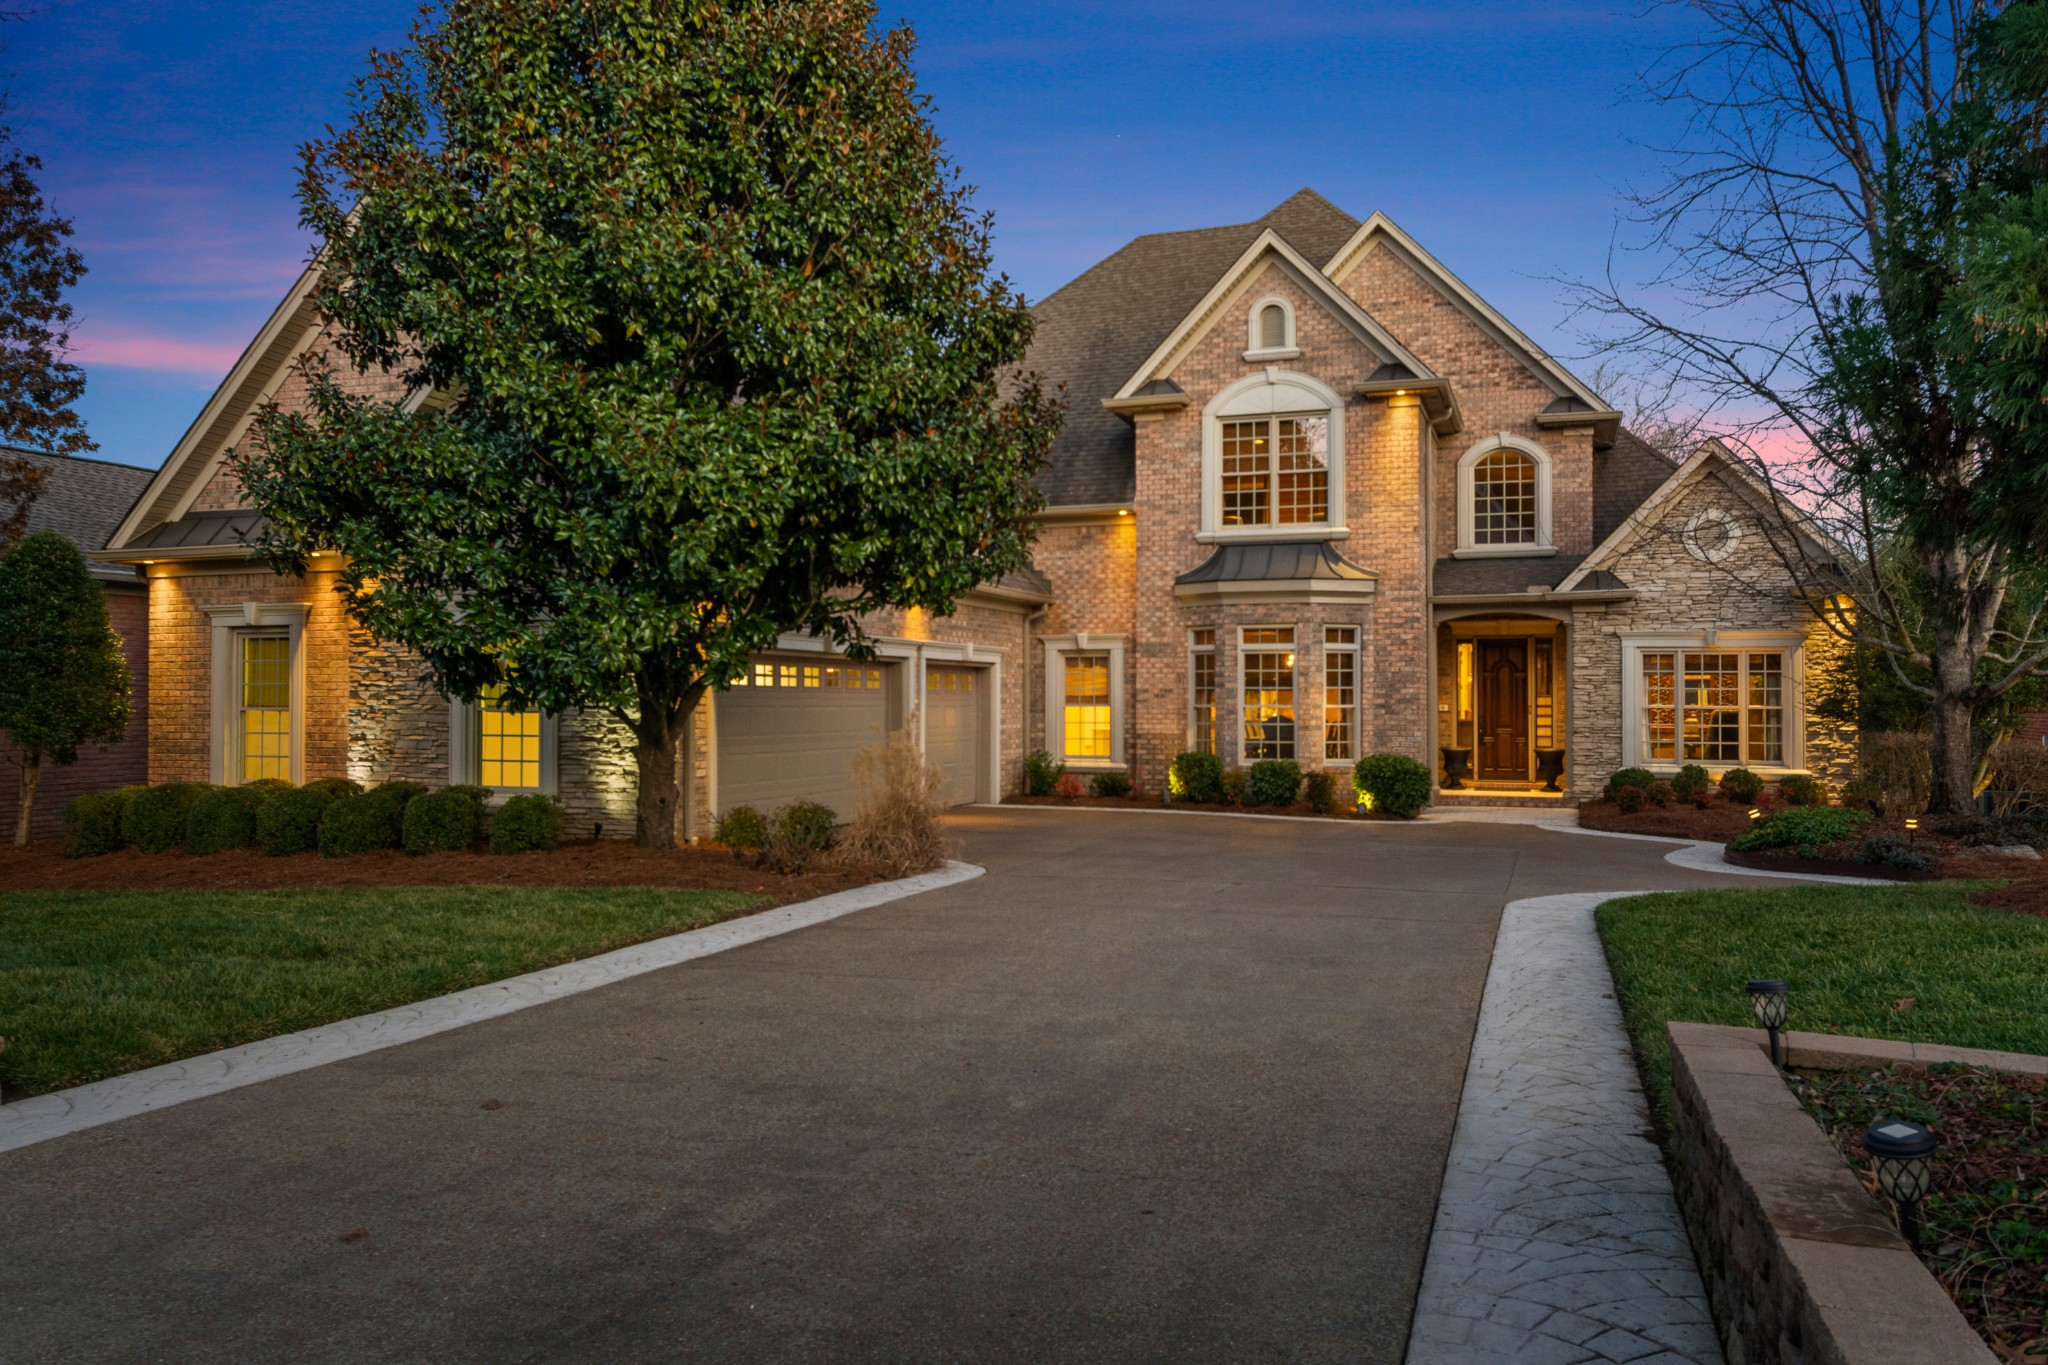 135 Joshuas Run, Goodlettsville, TN 37072 - Goodlettsville, TN real estate listing